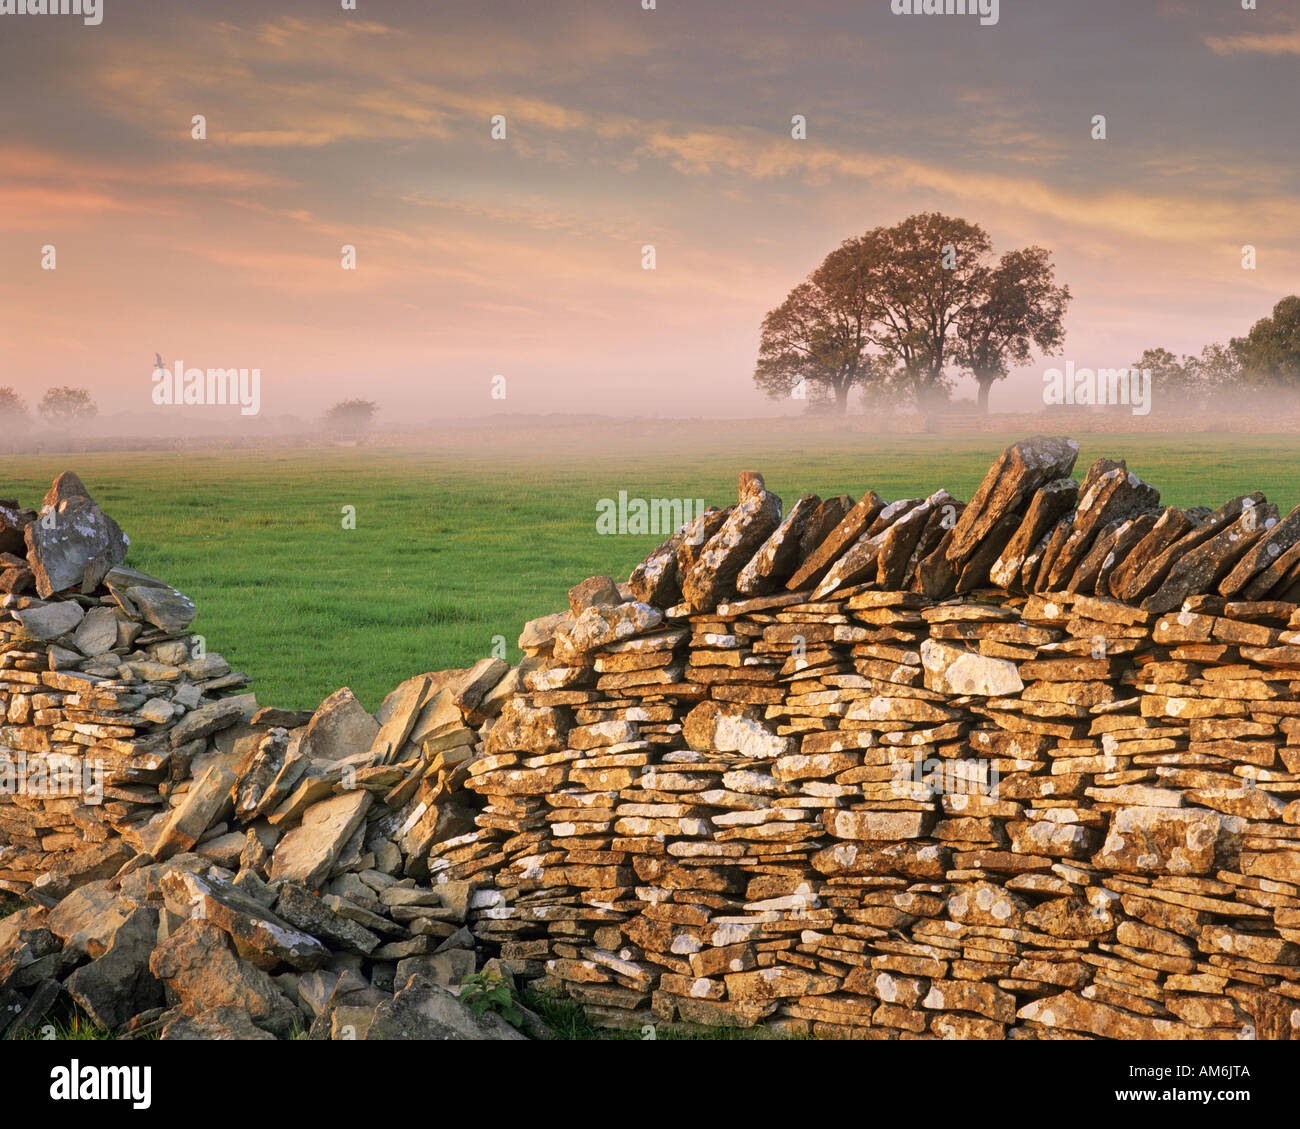 GB - GLOUCESTERSHIRE: Typische Cotswold Szene Stockbild